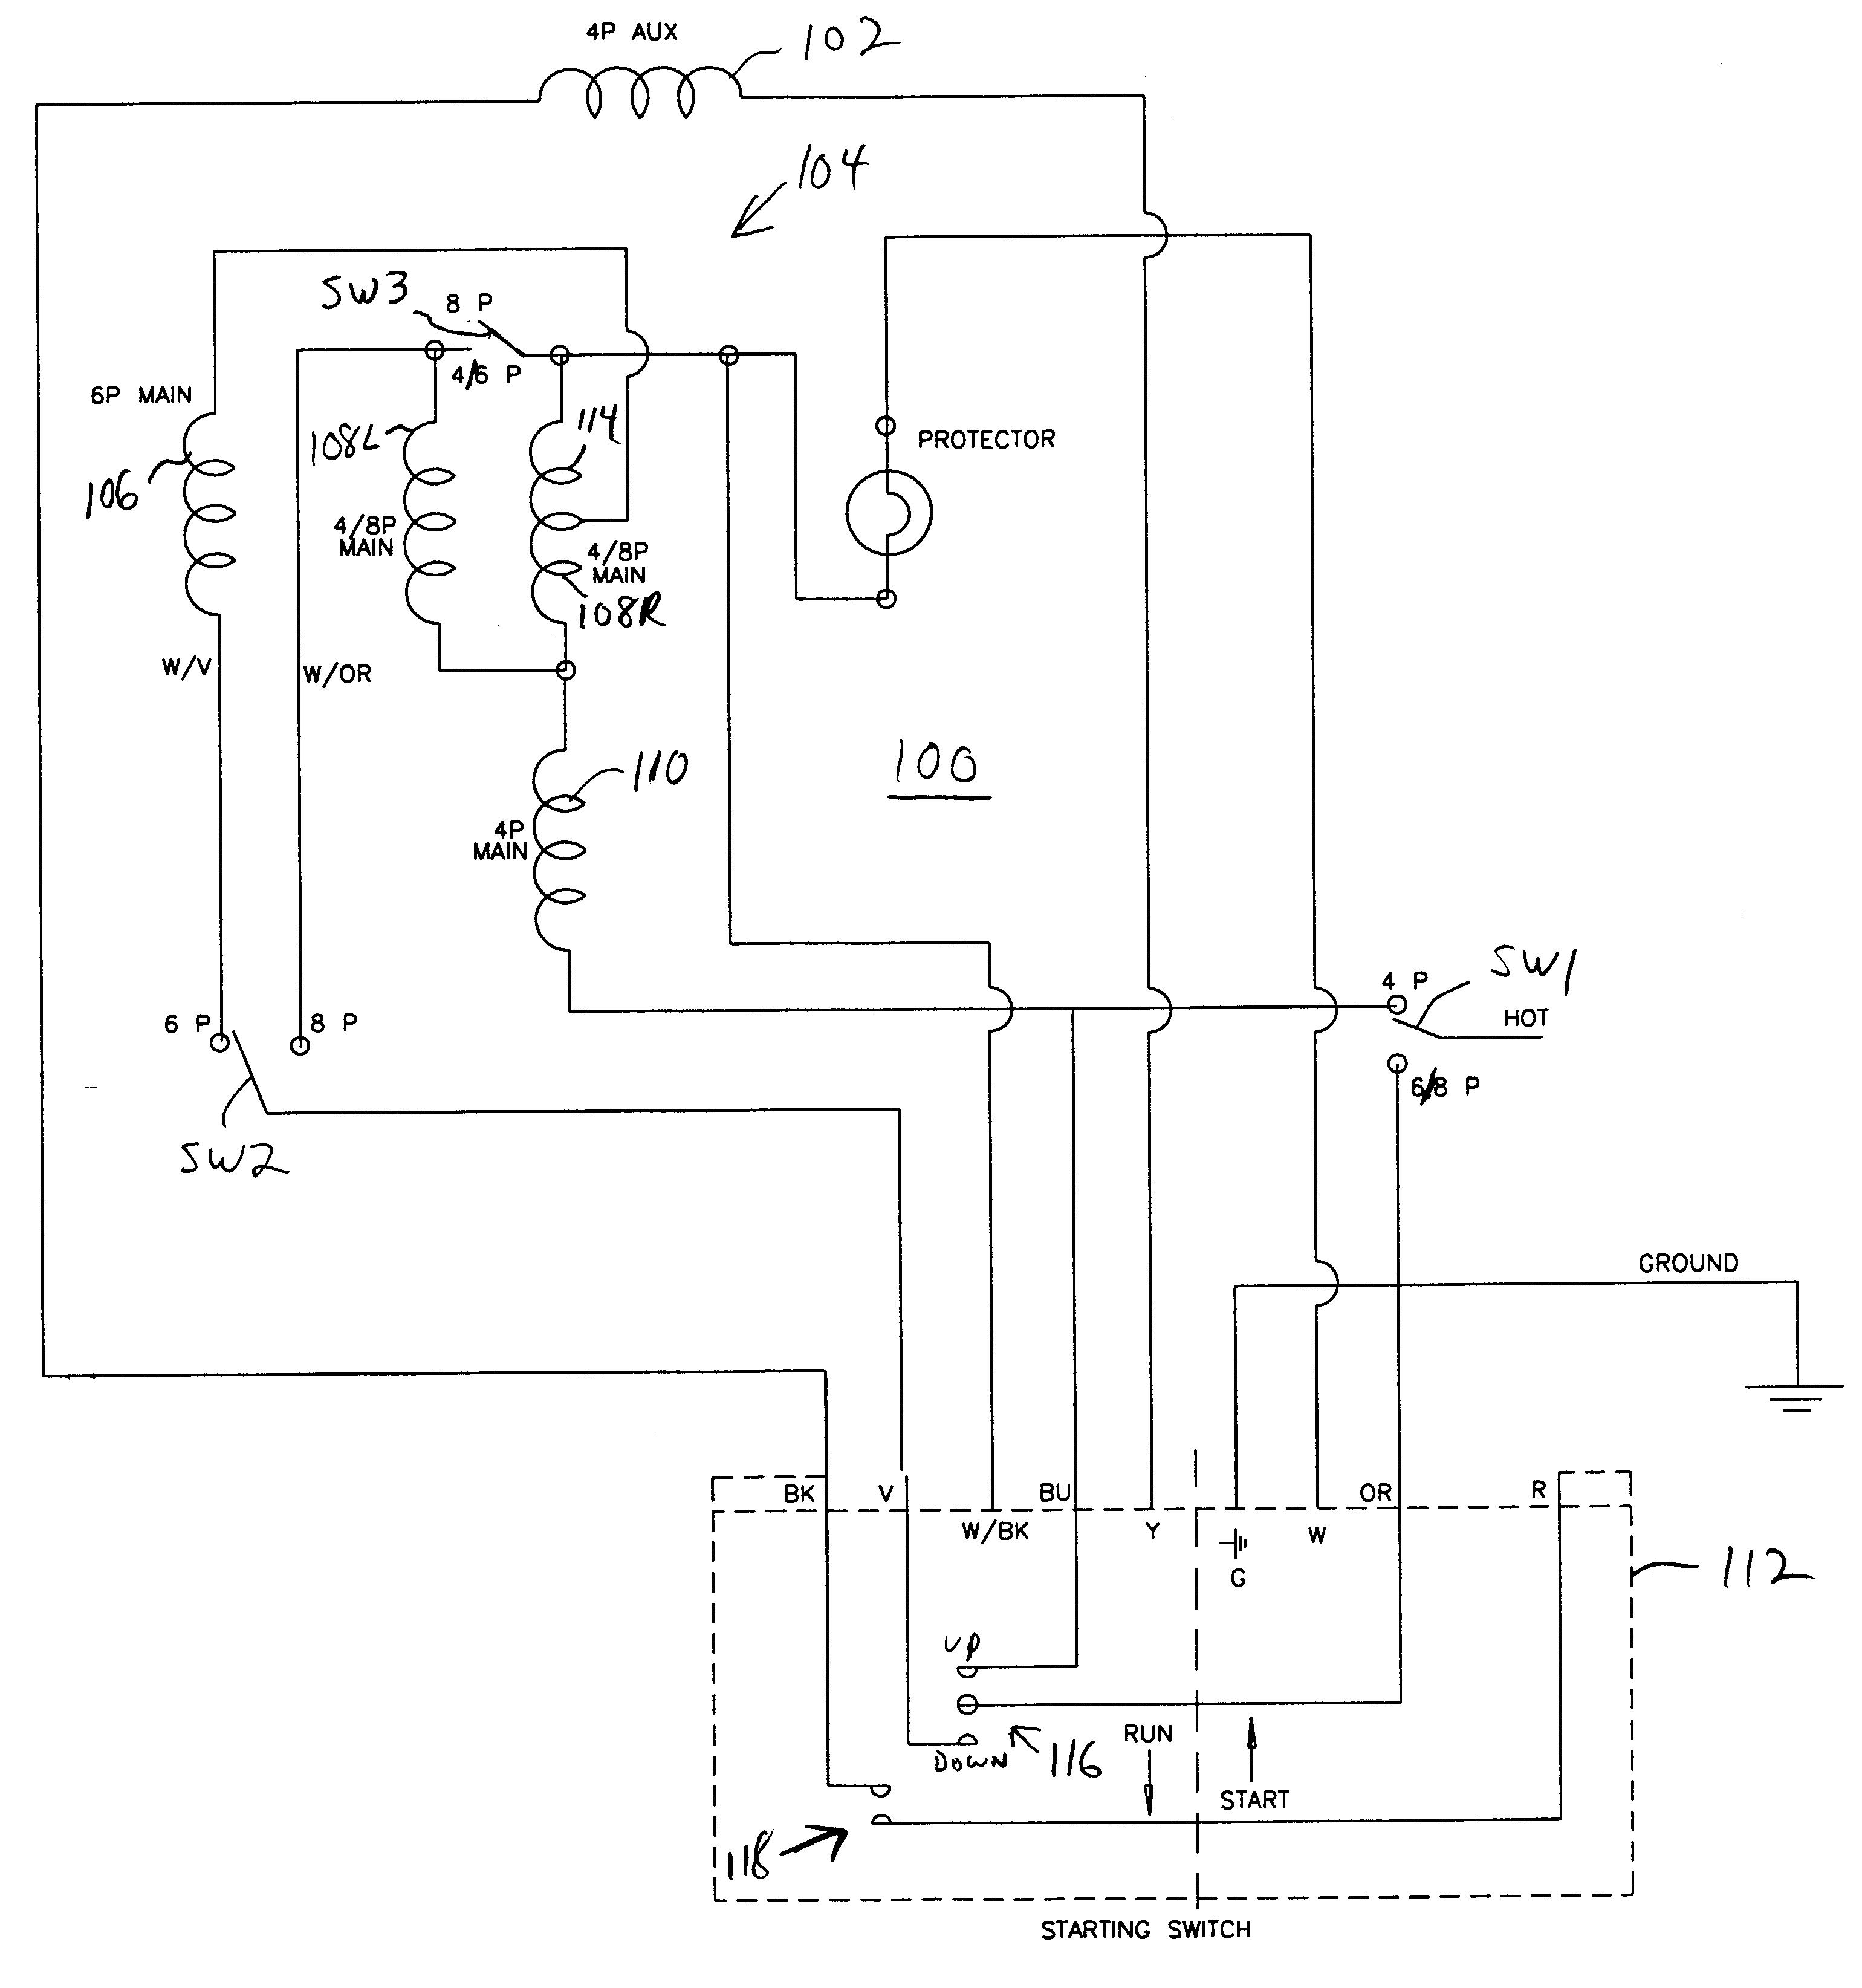 Century Furnace Parts Diagram | Wiring Diagram - Century Motor Wiring Diagram